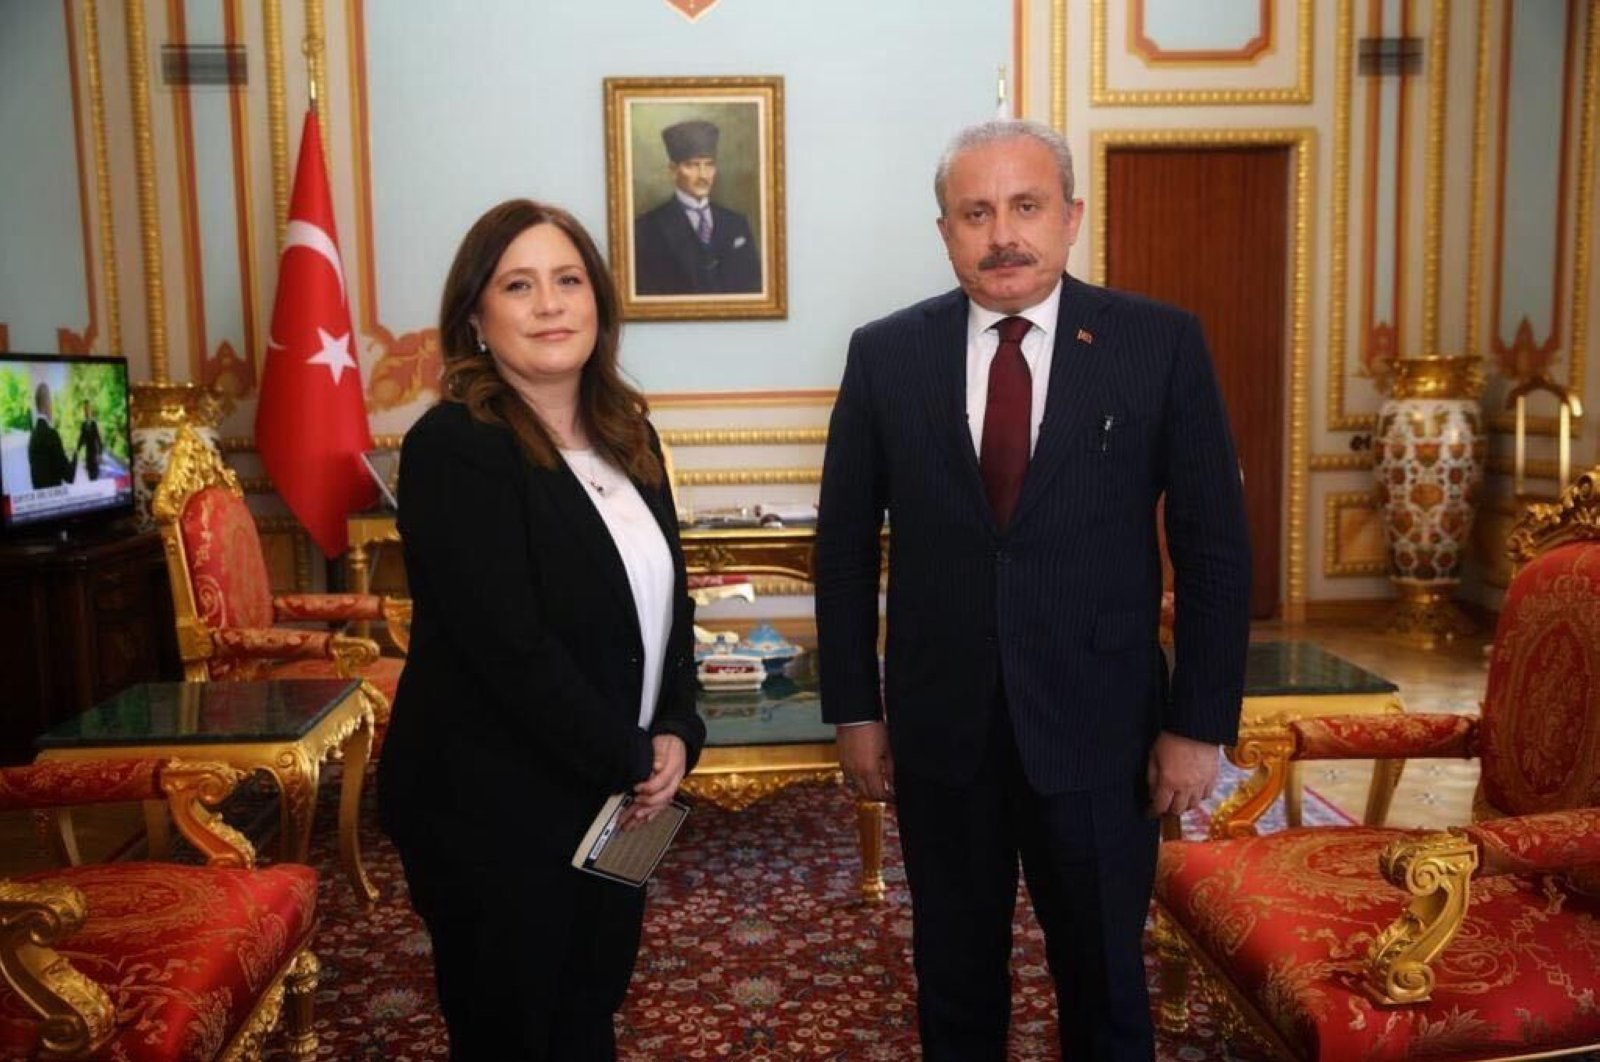 Turkish Parliament Speaker Mustafa Şentop (R) stands with Daily Sabah Ankara Representative Nur Özkan Erbay (L), Ankara, Turkey, July 14, 2020. (Daily Sabah Photo)